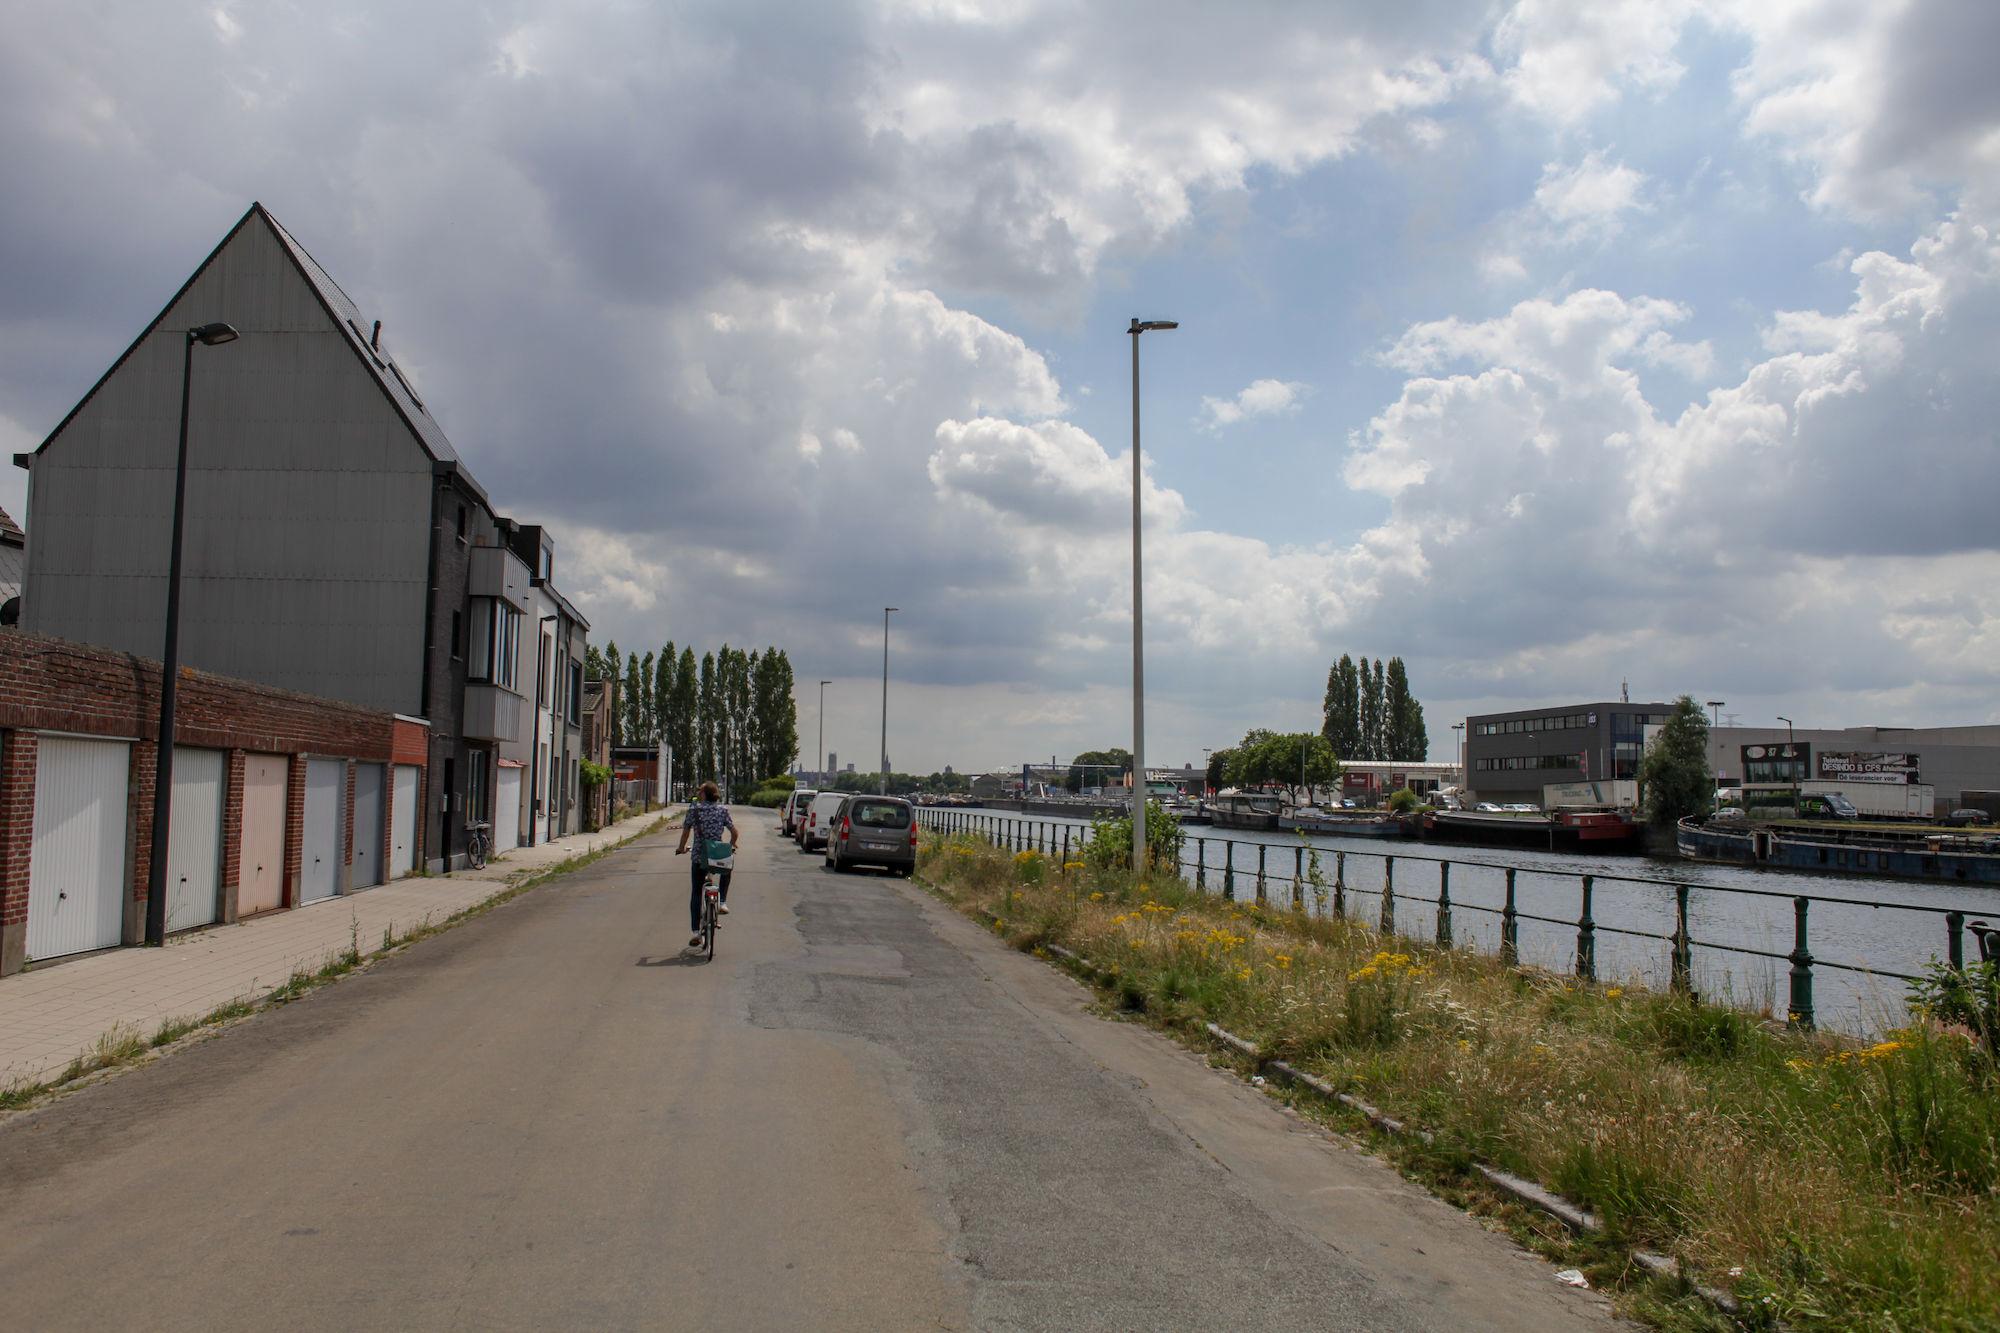 2019-07-02 Muide Meulestede prospectie Wannes_stadsvernieuwing_IMG_0381-3.jpg